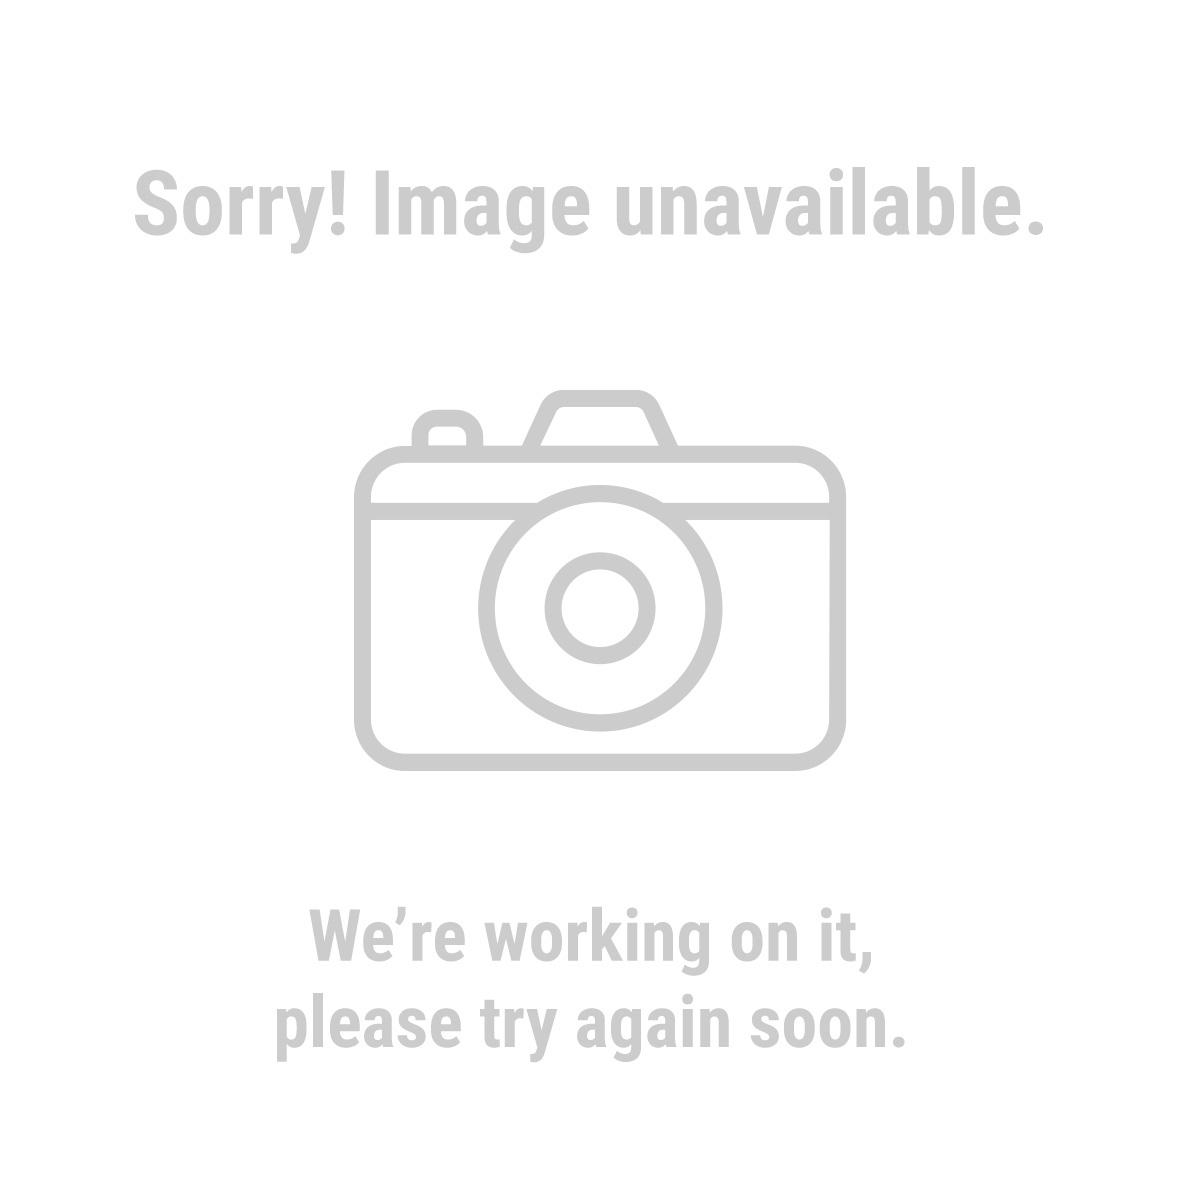 Maddox 63266 Radiator Pressure Tester Kit